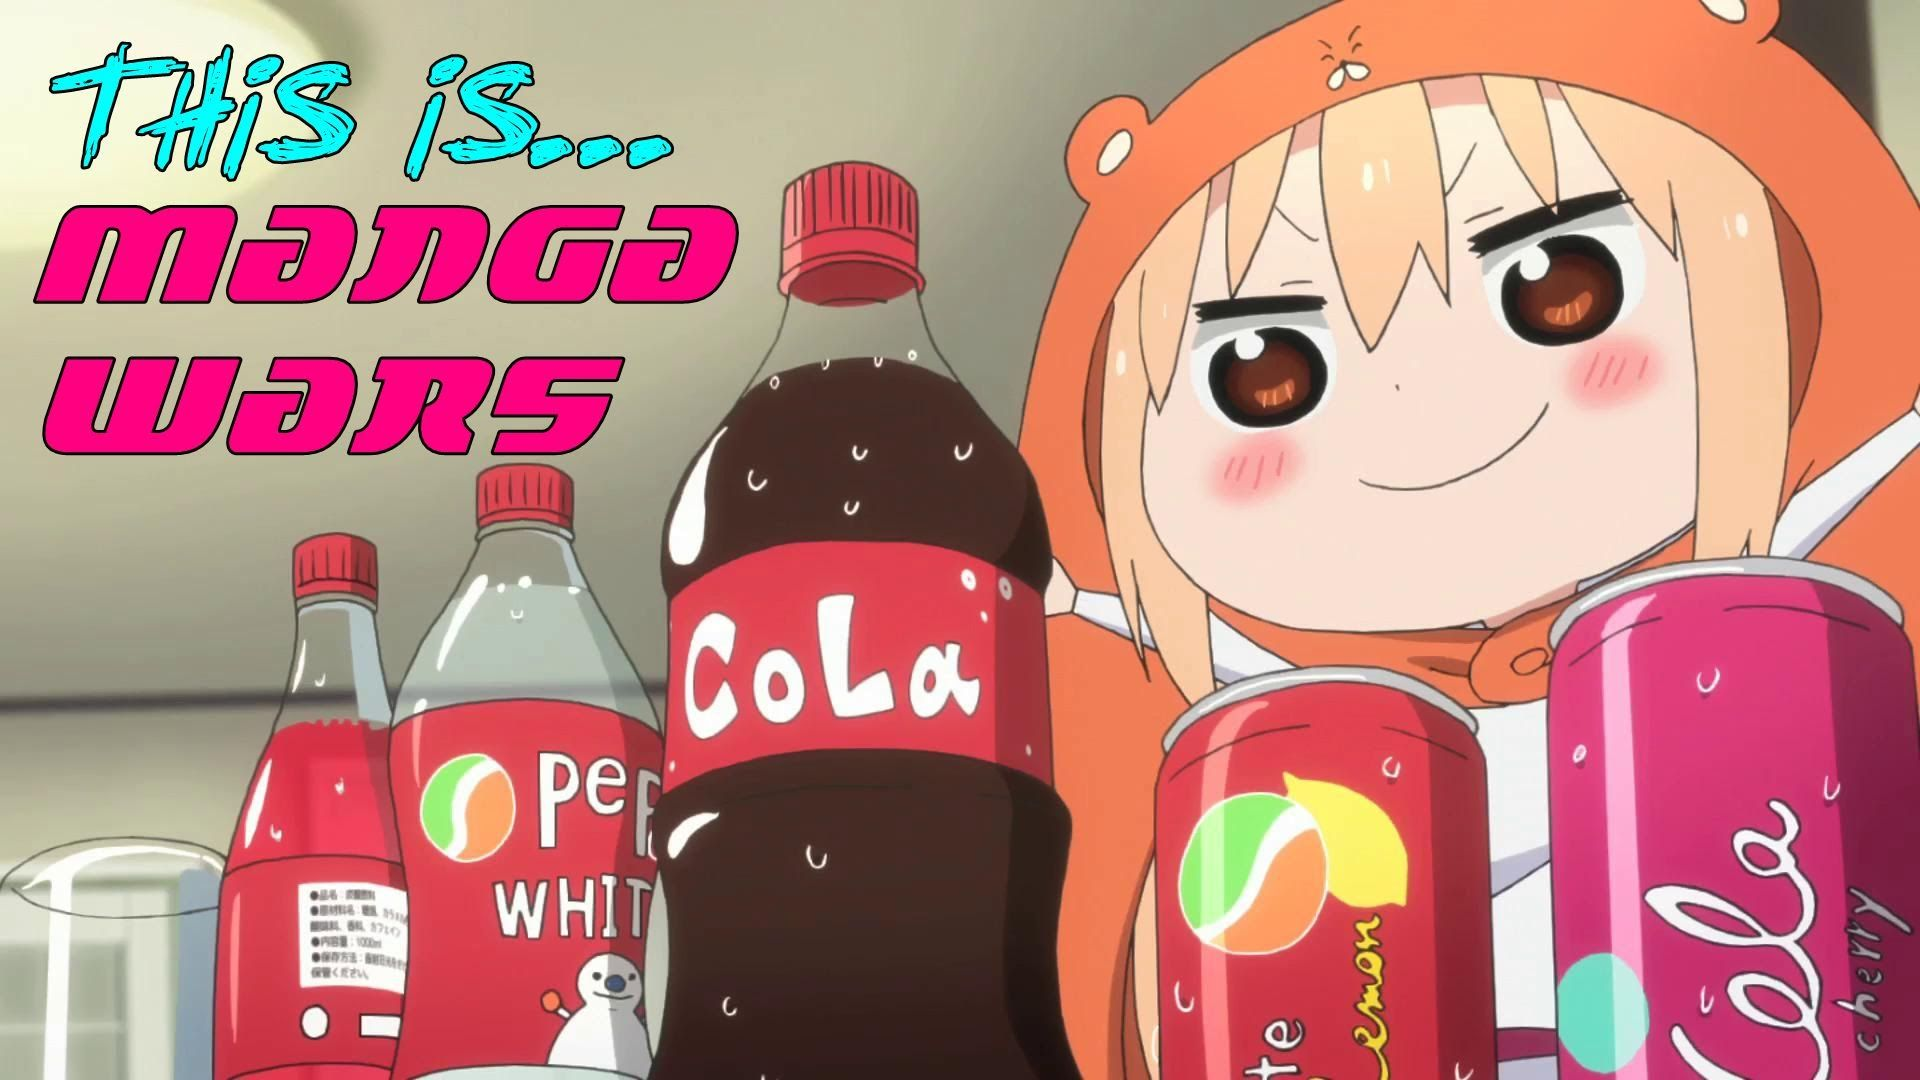 Pin by Bloodsyrup on Manga Wars Himouto umaru chan